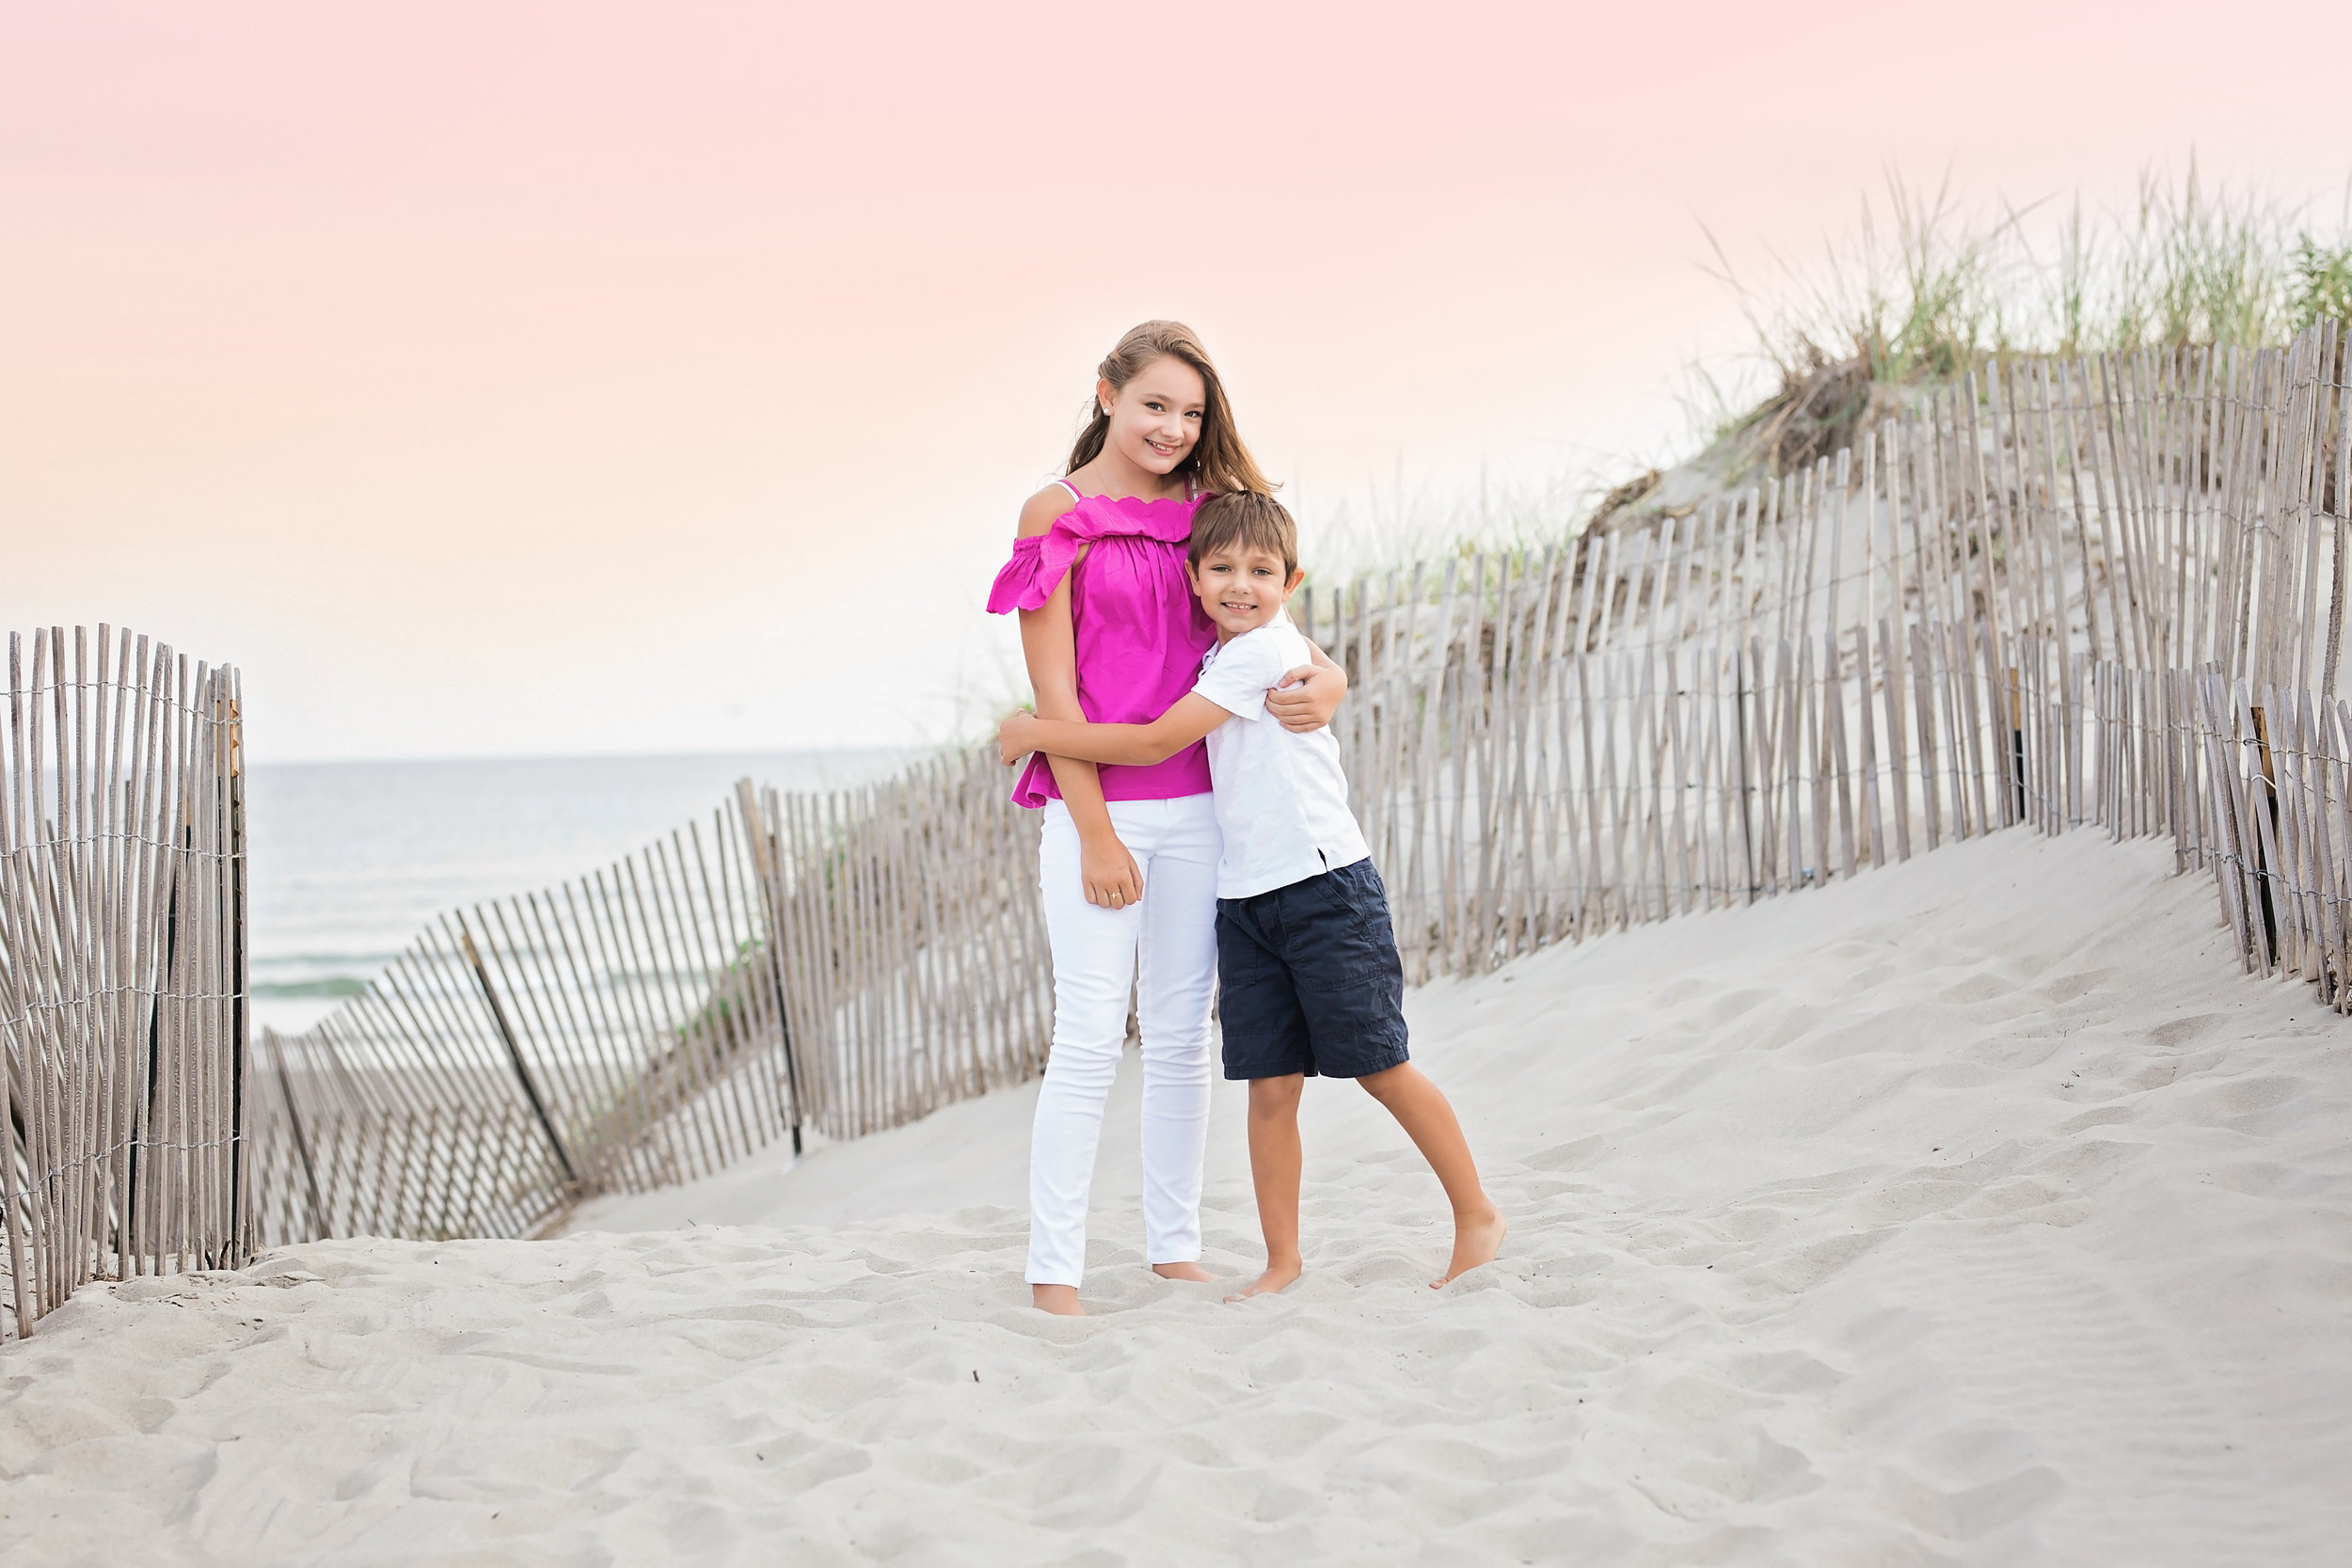 beach on kids maybe.jpg